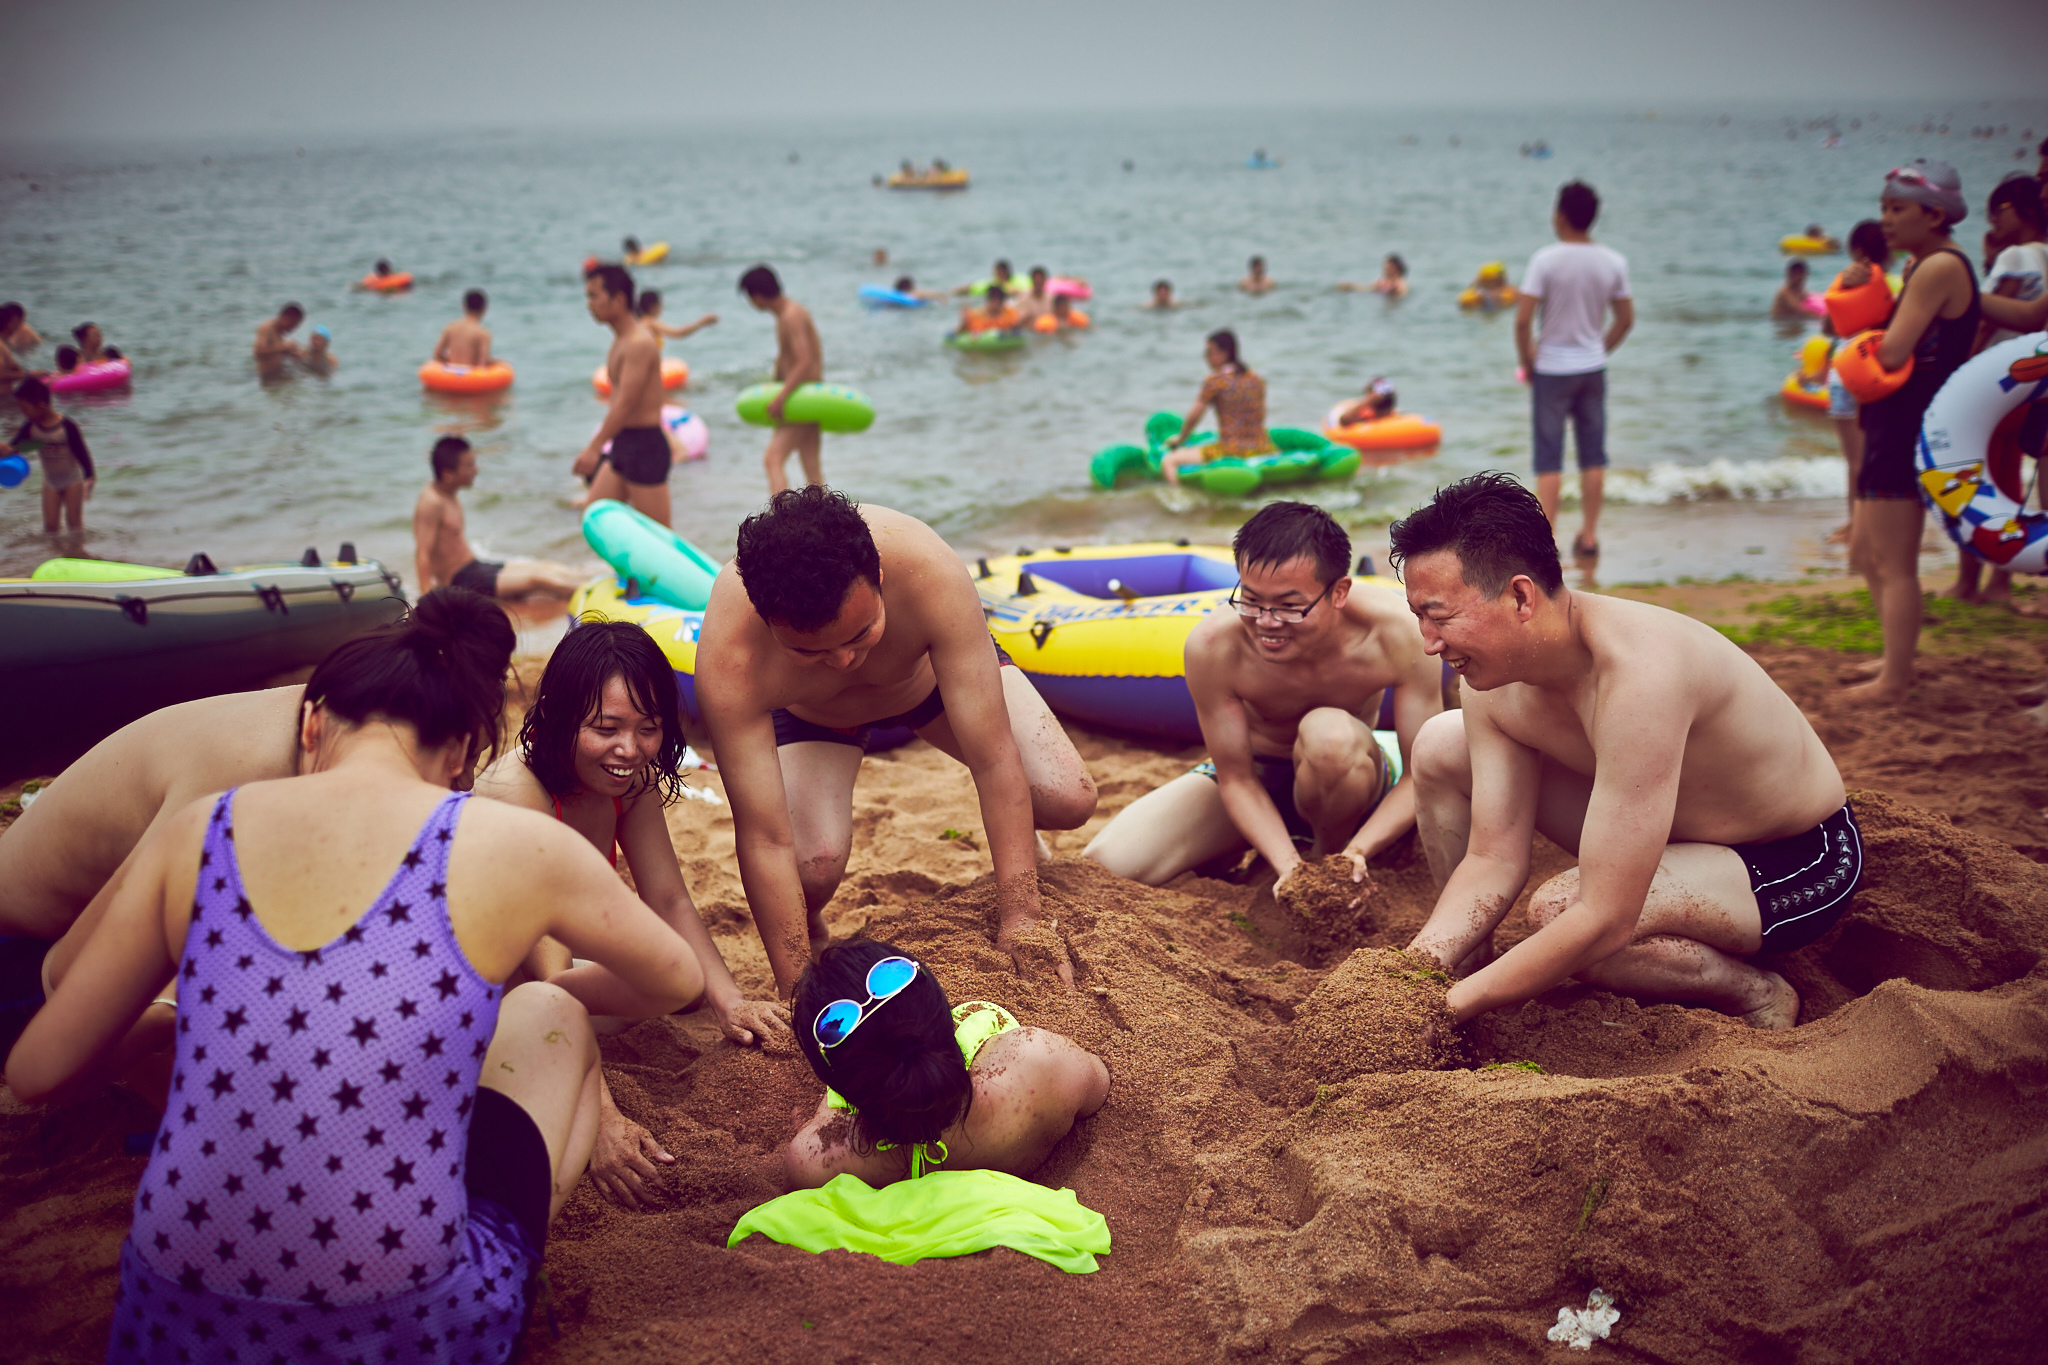 Qingdao__AC8P0561 1 copy.jpg